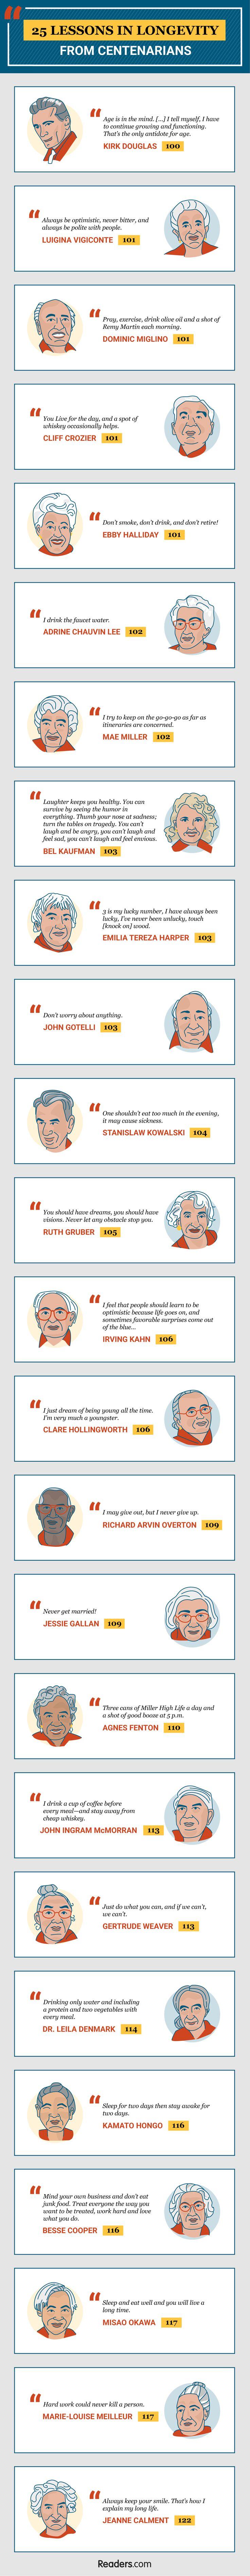 25 Lessons in Longevity from Centenarians   Readers.com   Happy Eyes. Happy Wallet.